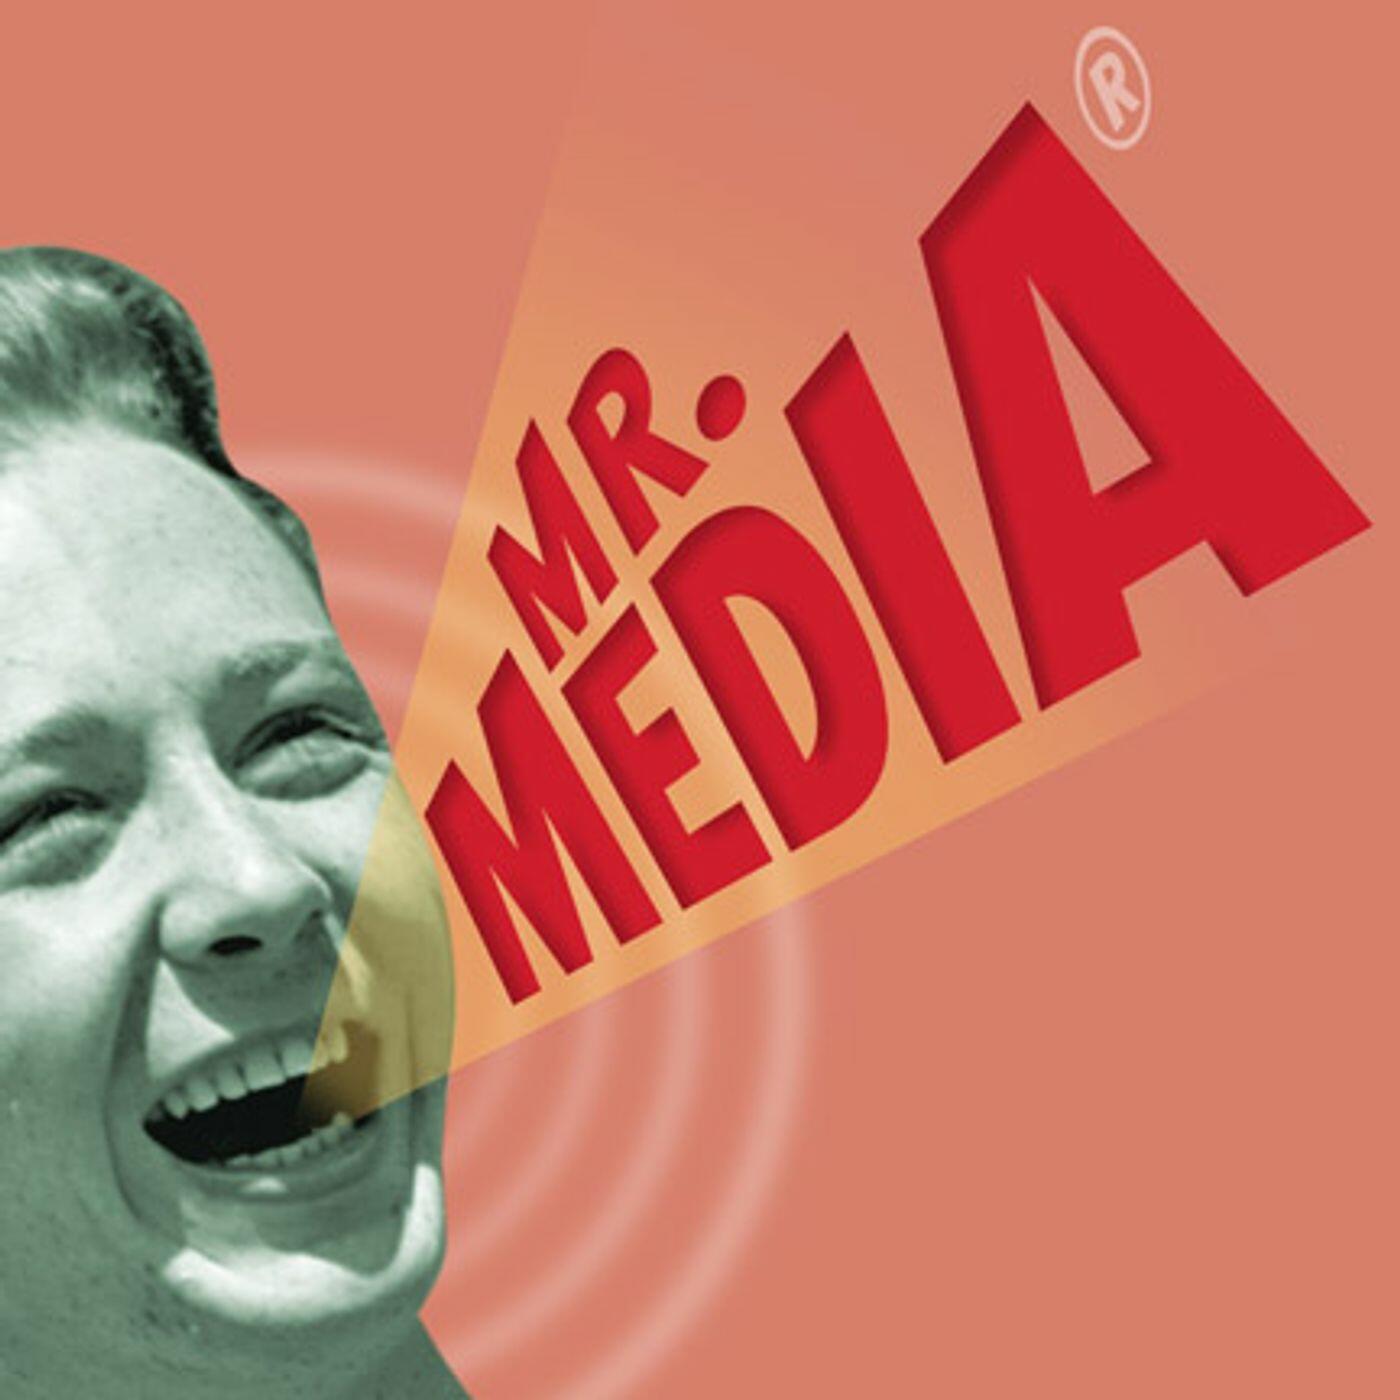 Mr. Media Interviews by Bob Andelman